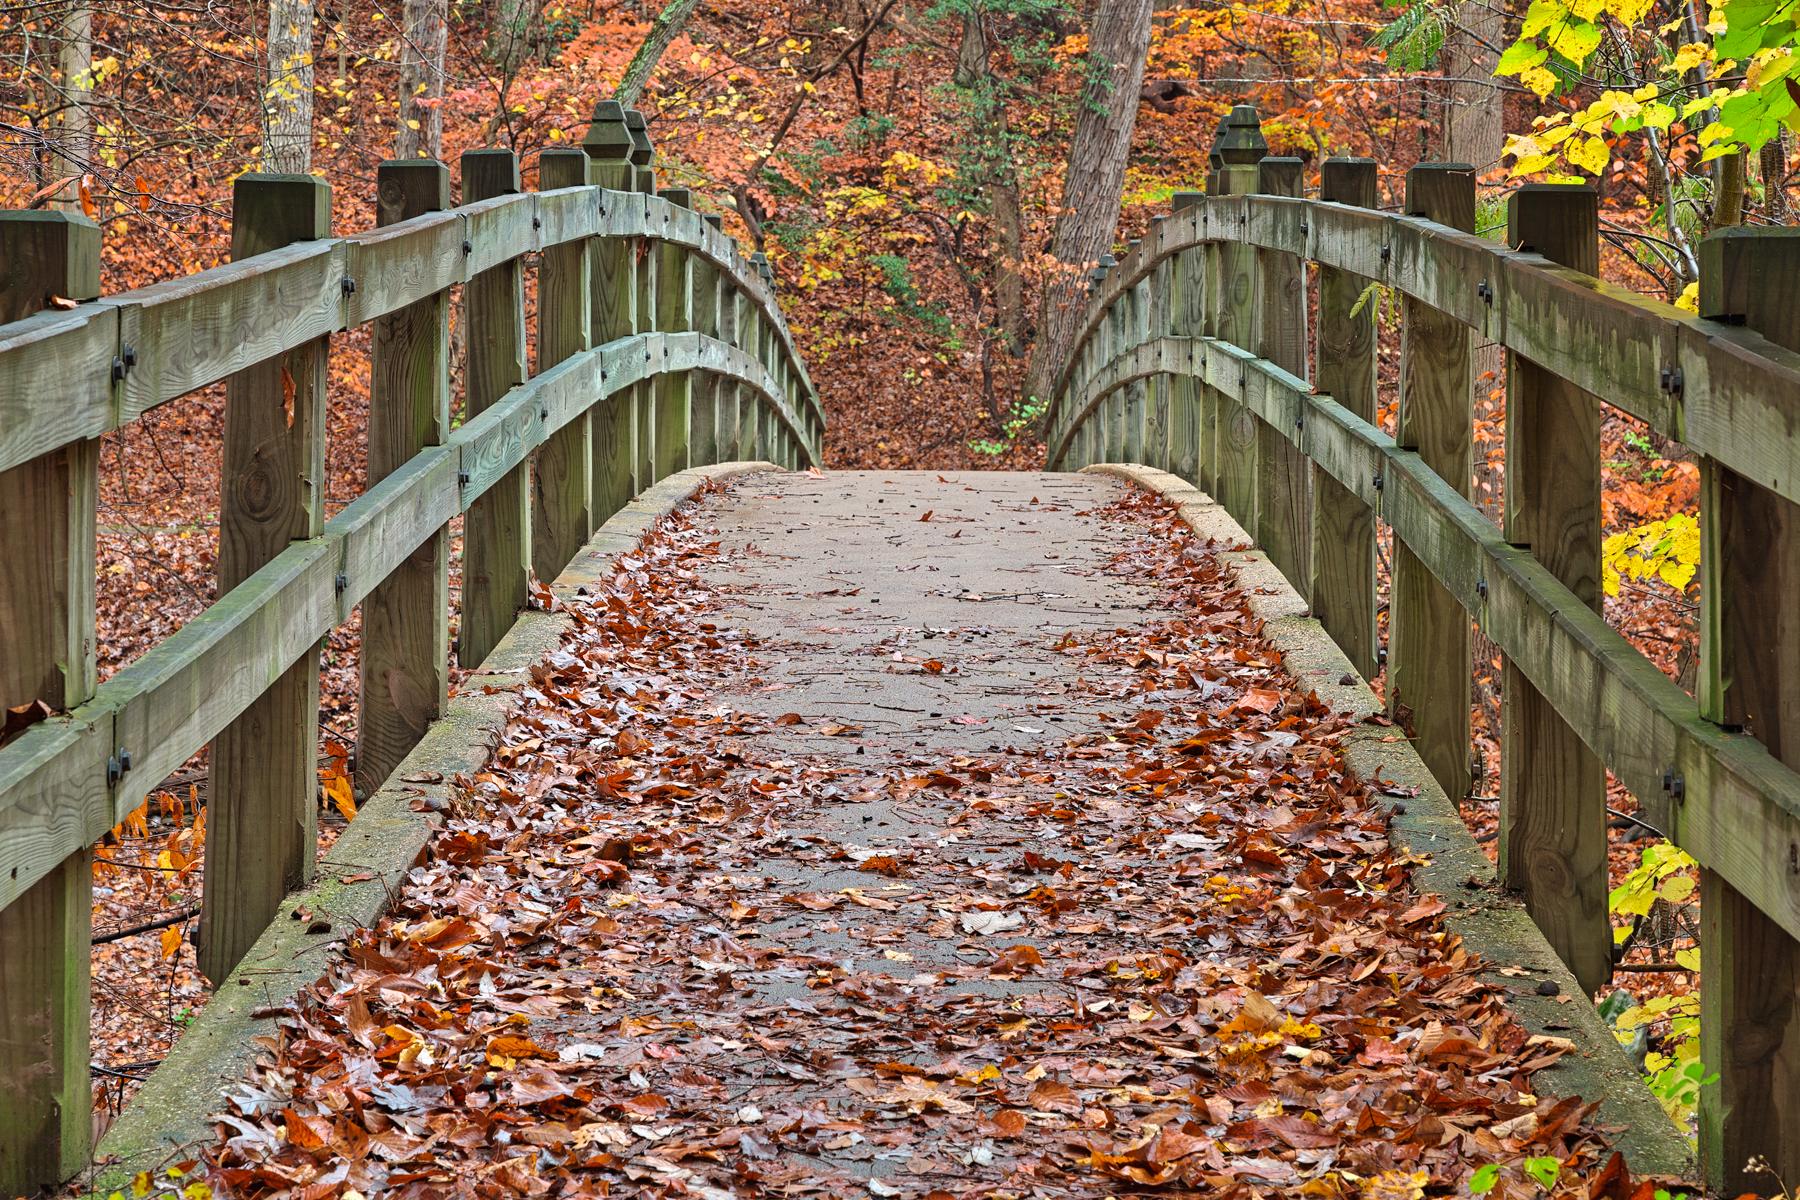 Bridge to fall - hdr photo